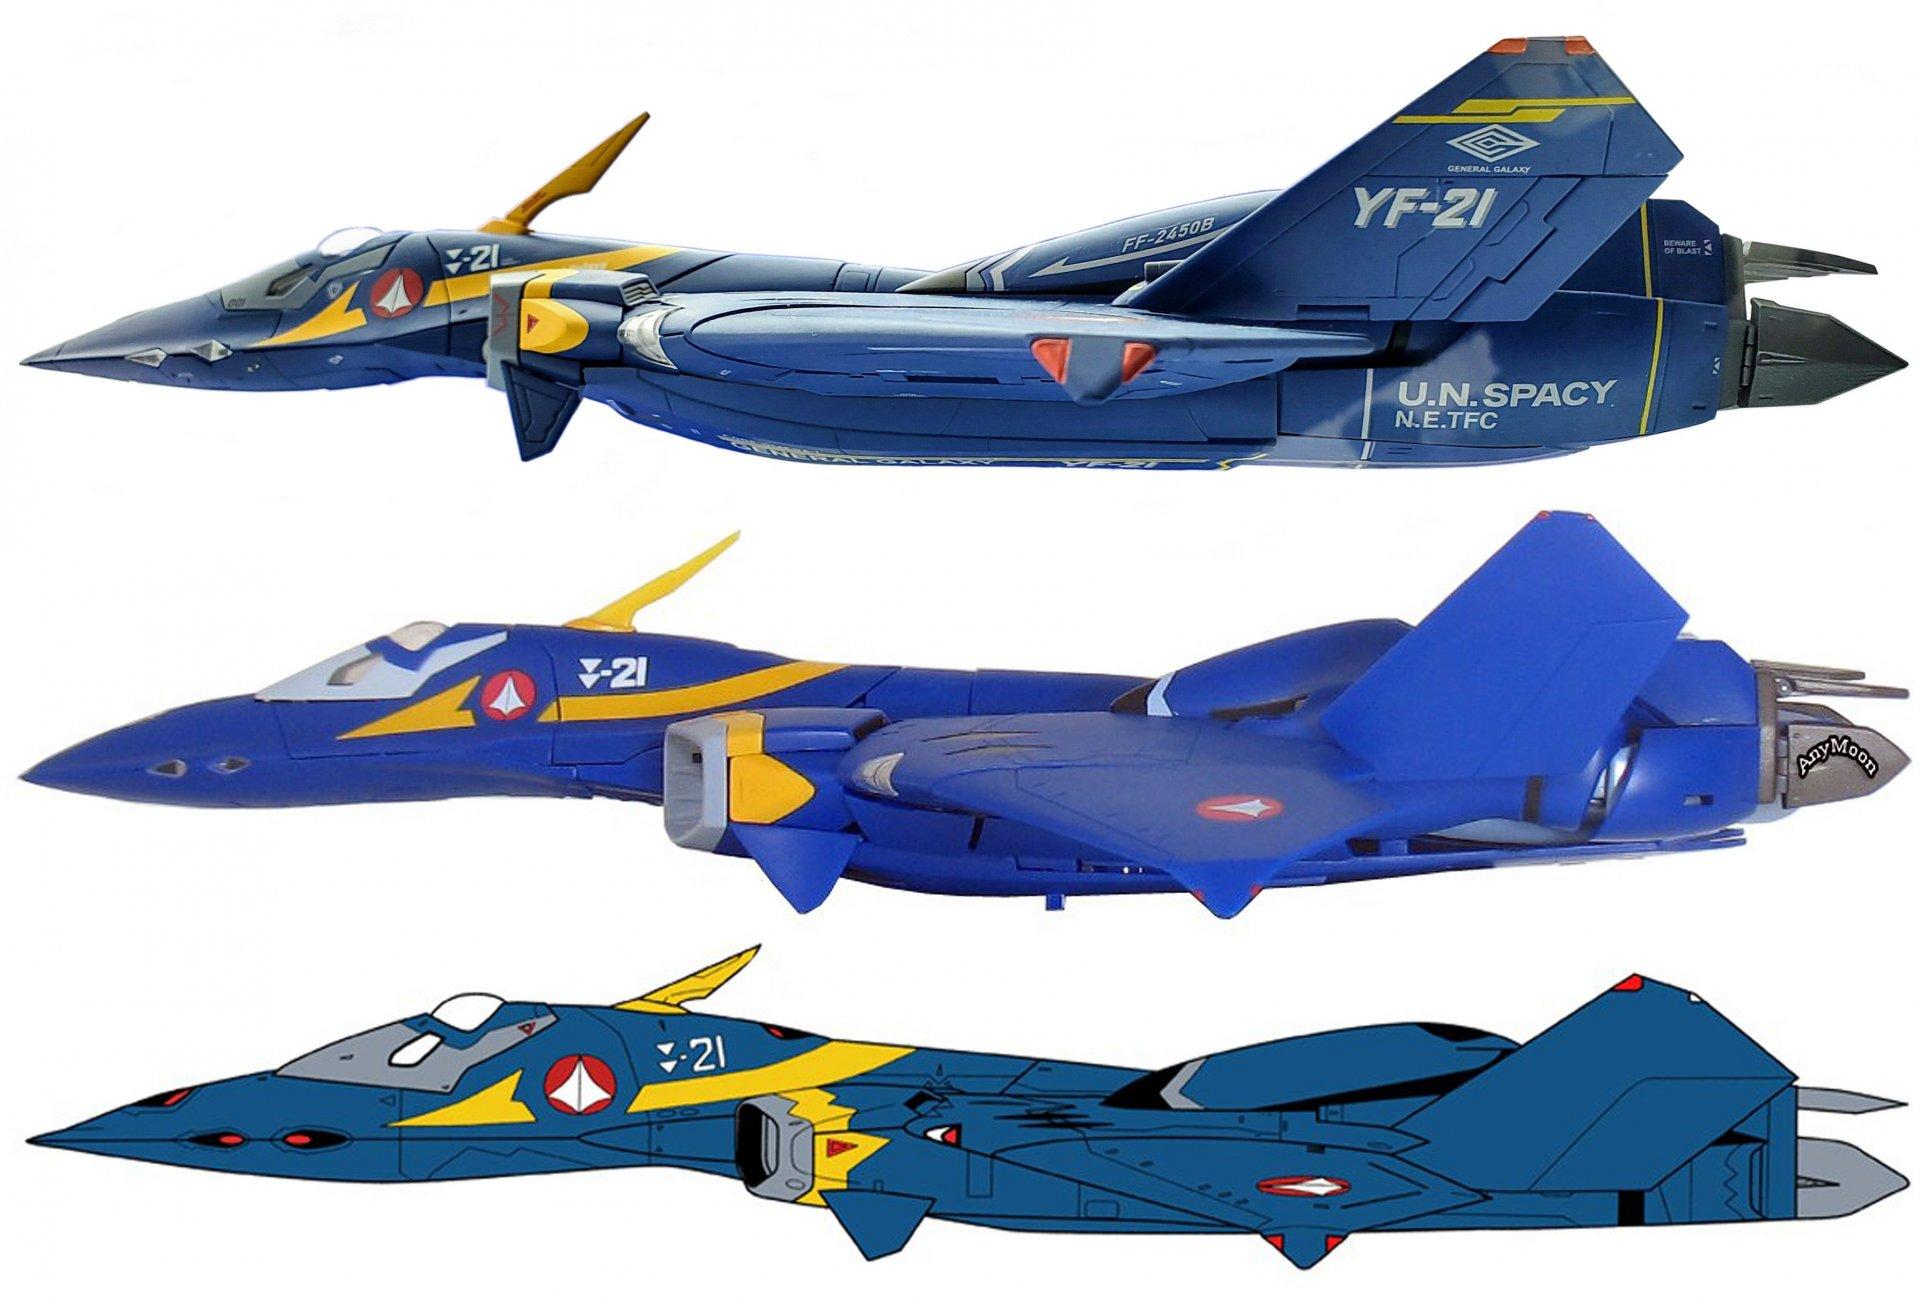 YF-21 DX-Yamato-LineArt comparison_3.jpg